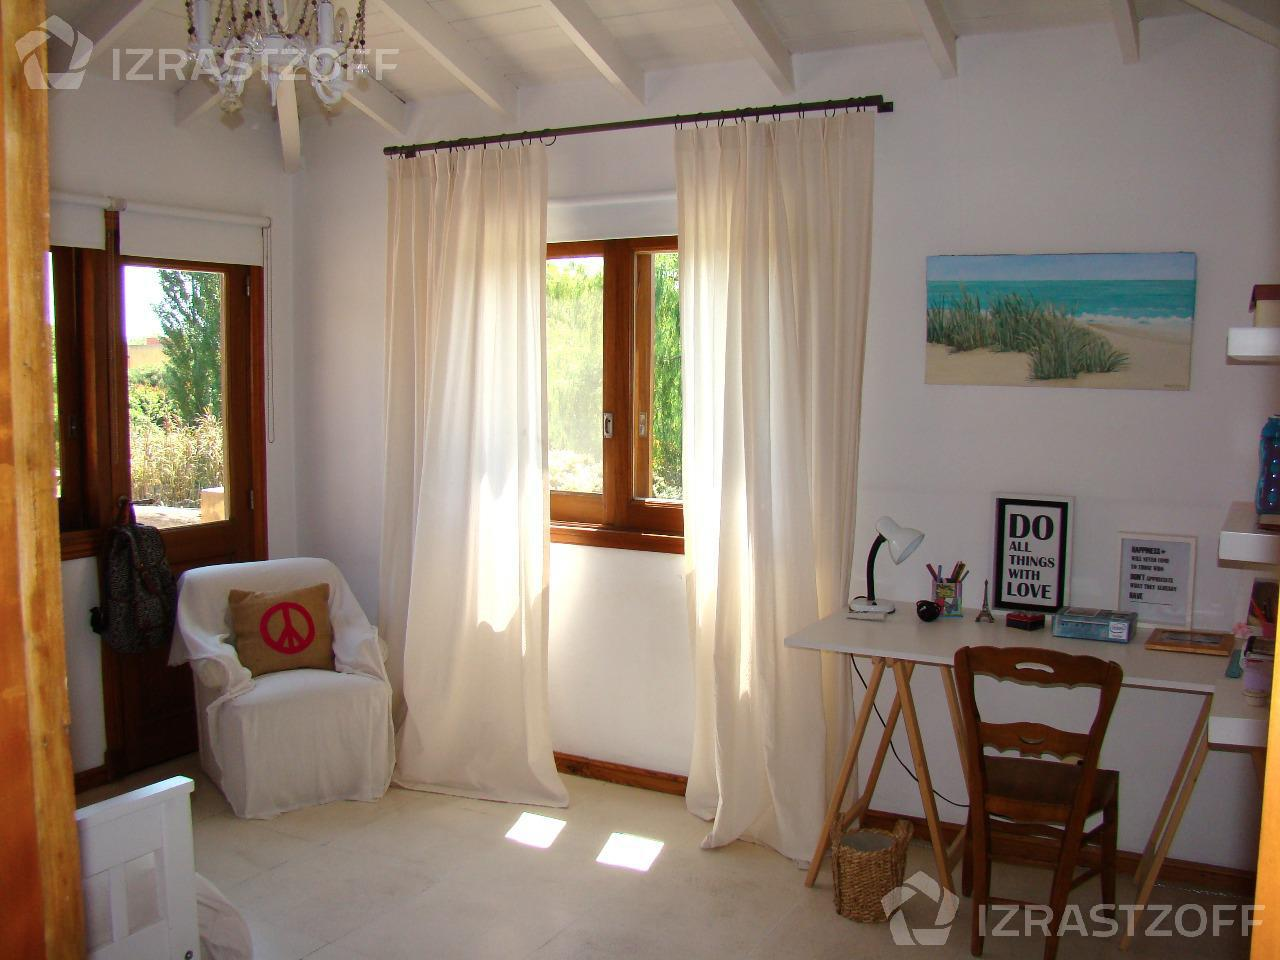 Casa--Santa Barbara-santa bárbara al 500